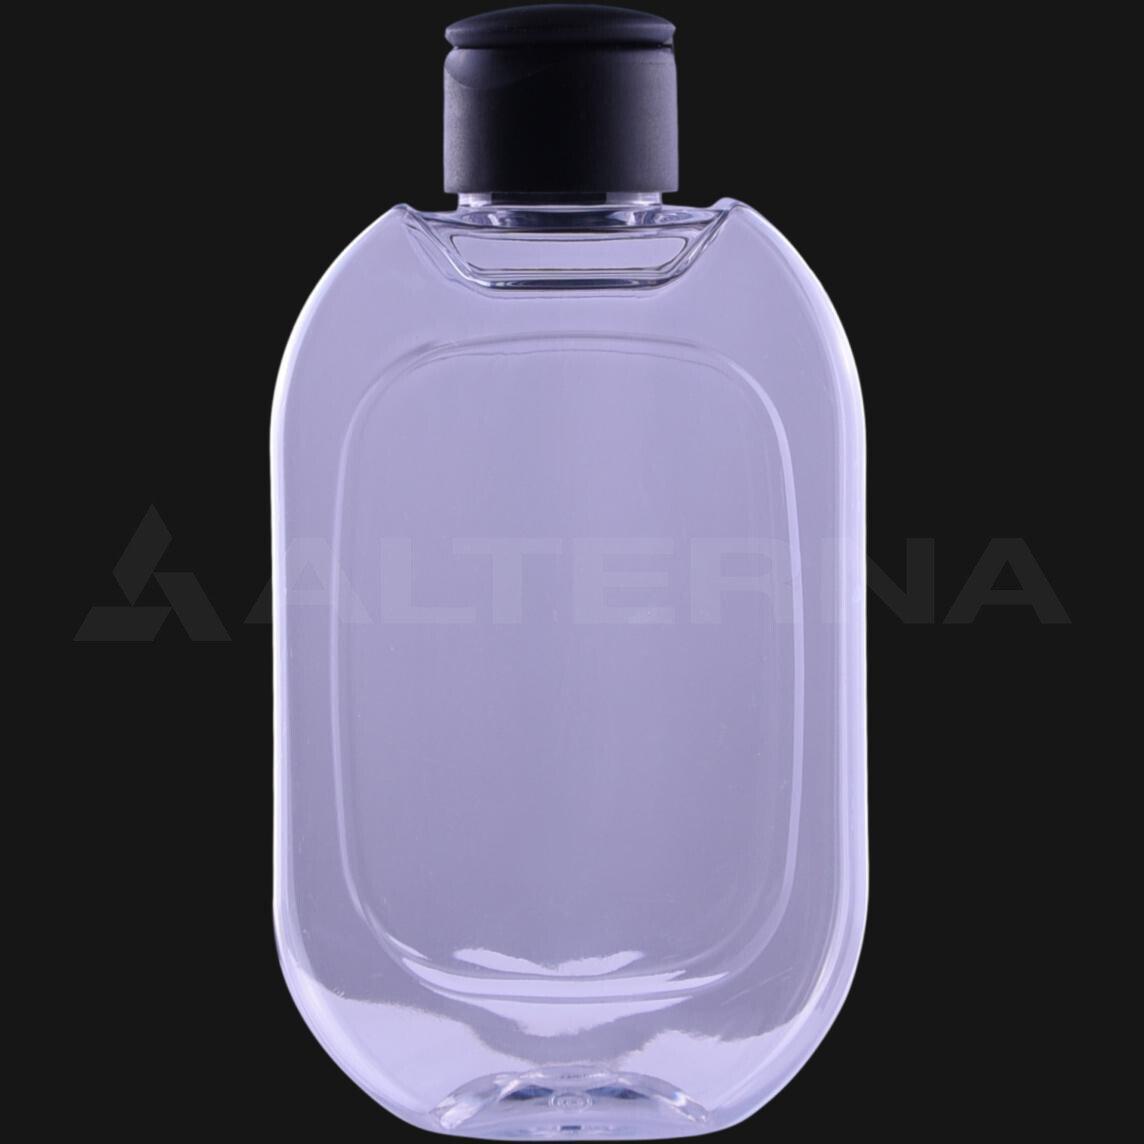 200 ml PET Flat Bottle with 24 mm Flip Top Cap